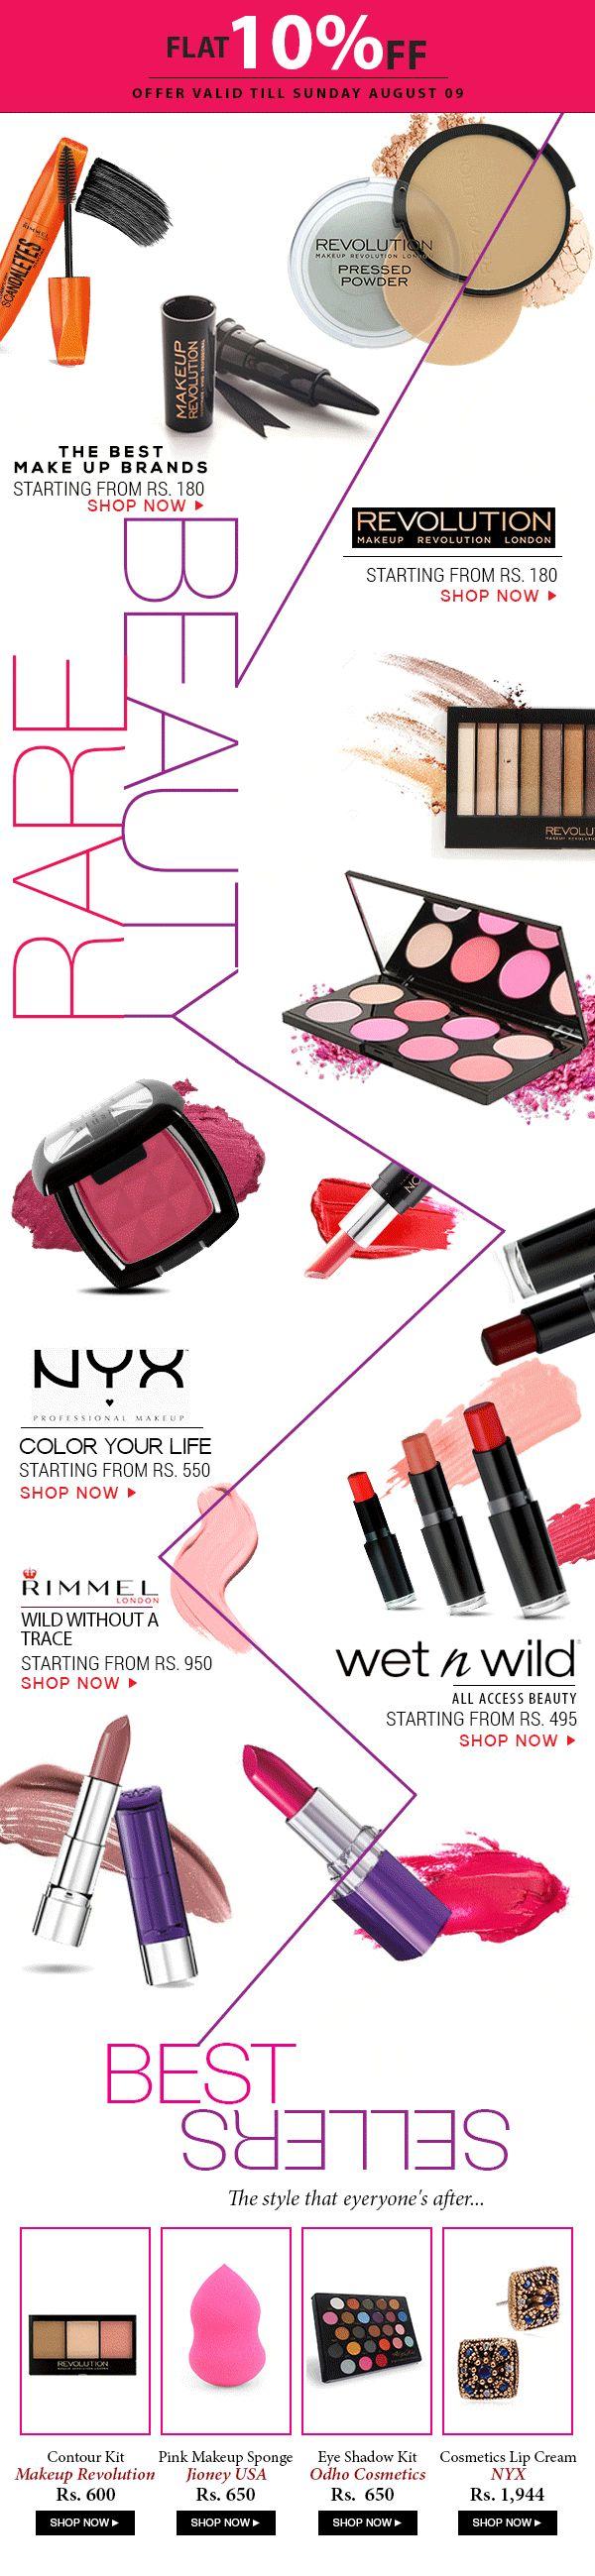 Makeup and Lipsticks on Daraz Pakistan Online Shopping 10